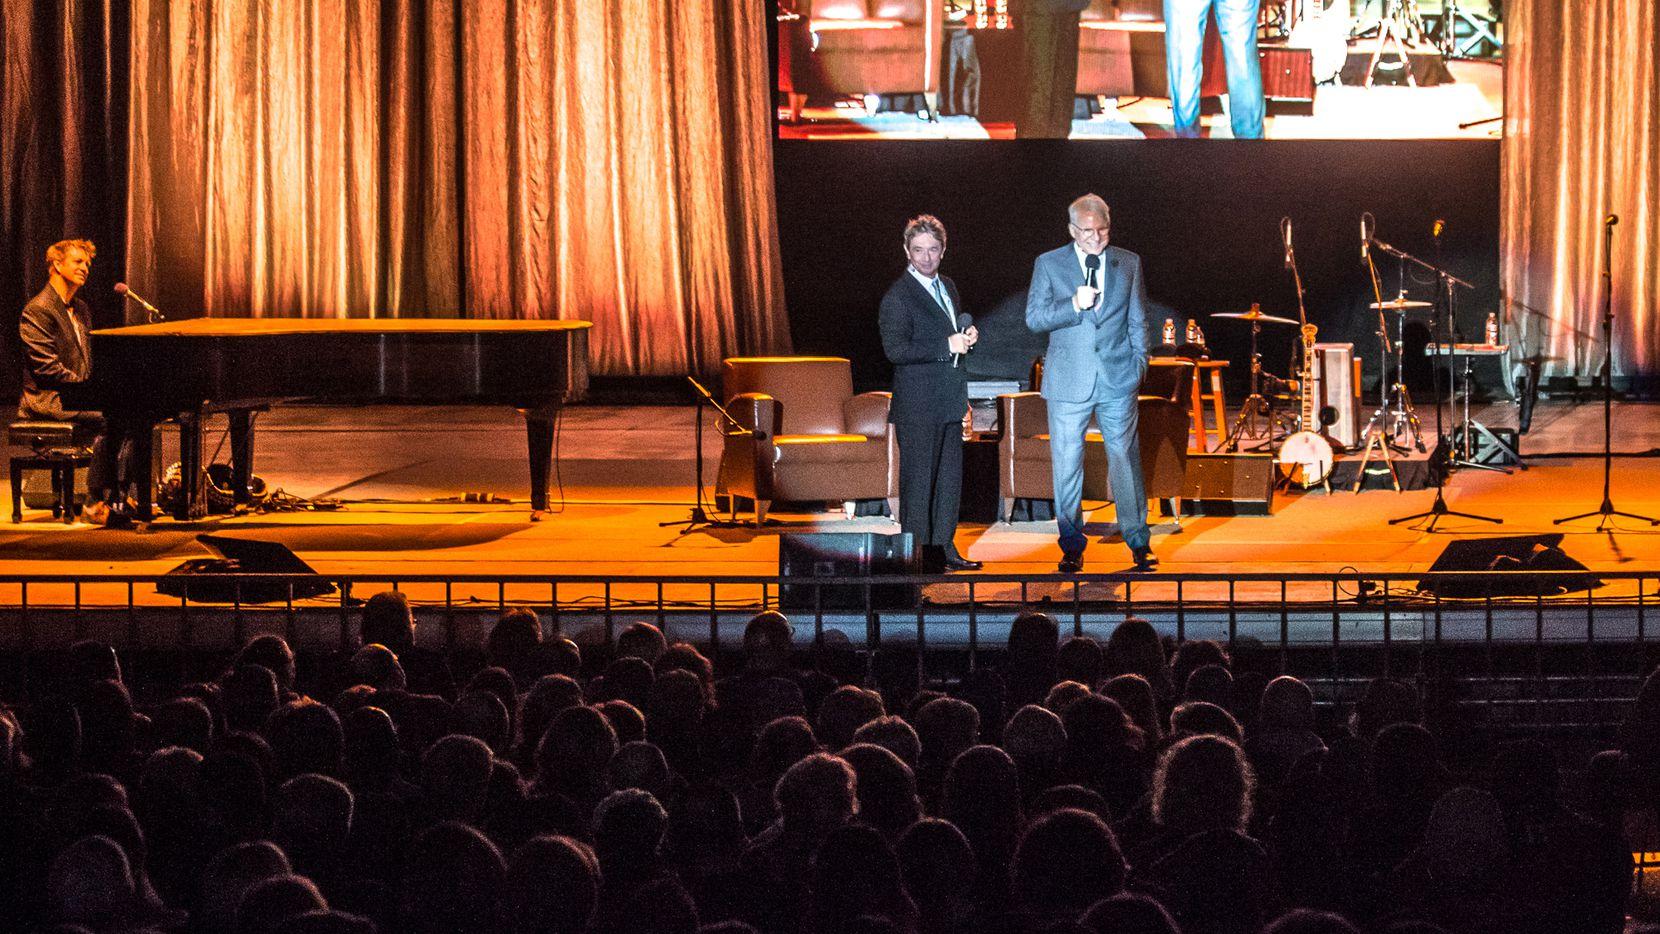 Martin Short and Steve Martin perform at Verizon Theatre in Grand Prairie on April 8.